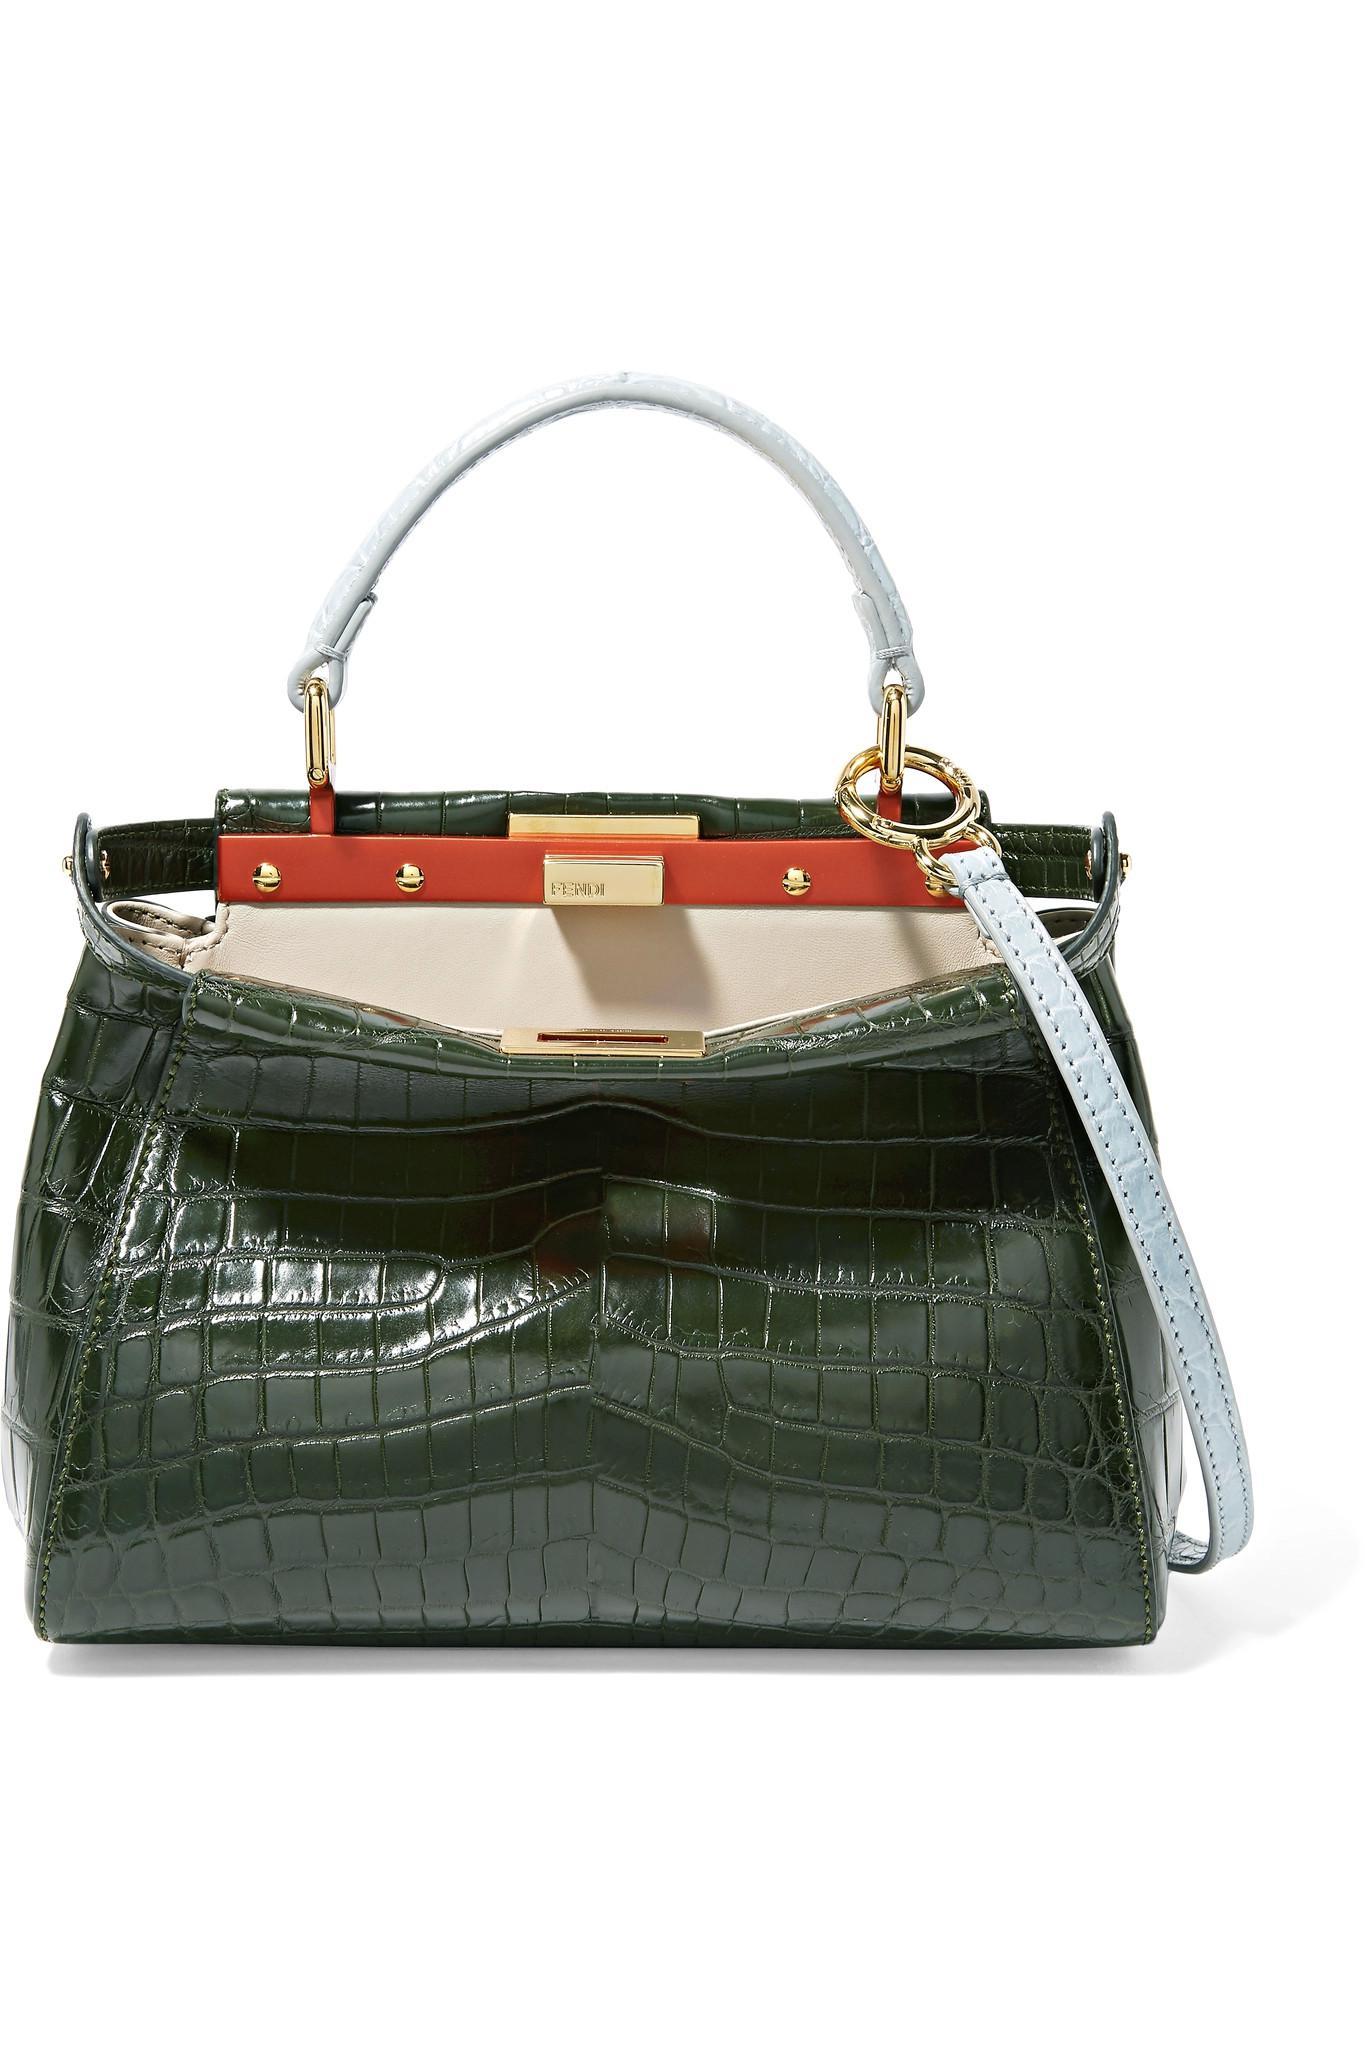 Lyst - Fendi Peekaboo Mini Crocodile Shoulder Bag in Green 2515fd58c7a7e